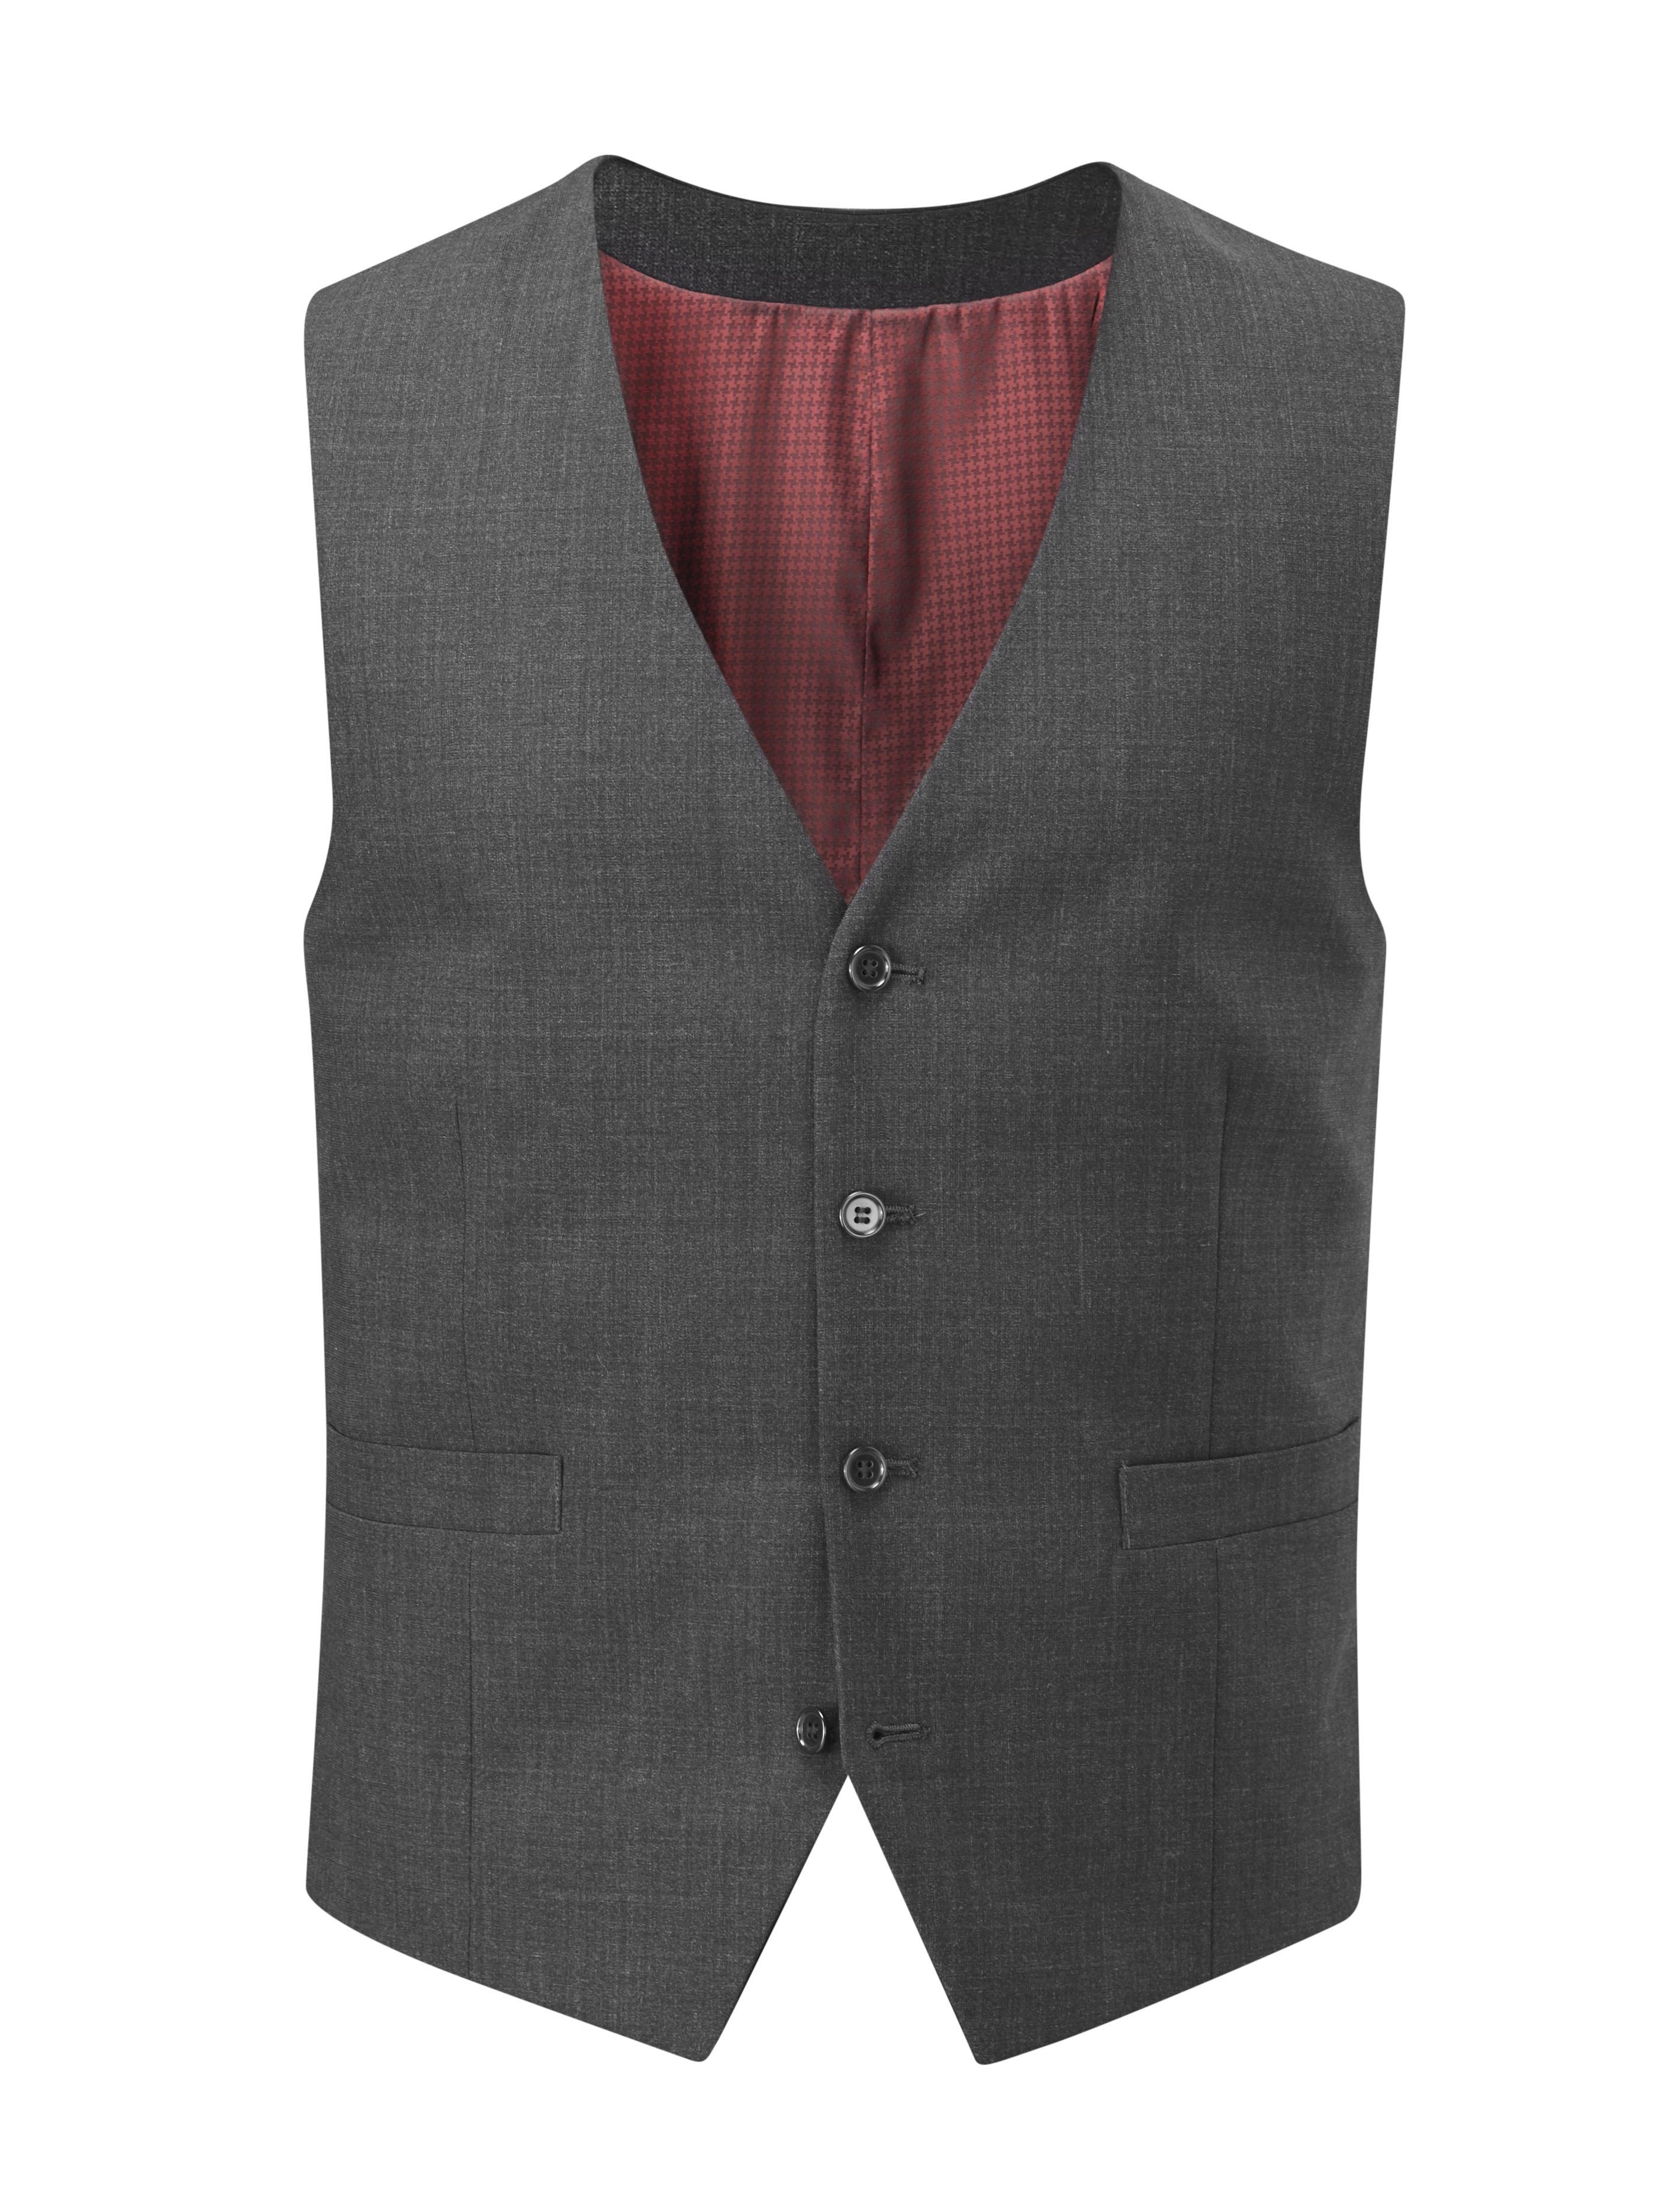 mm1331-darwin-charcoal-waistcoat-0.jpg